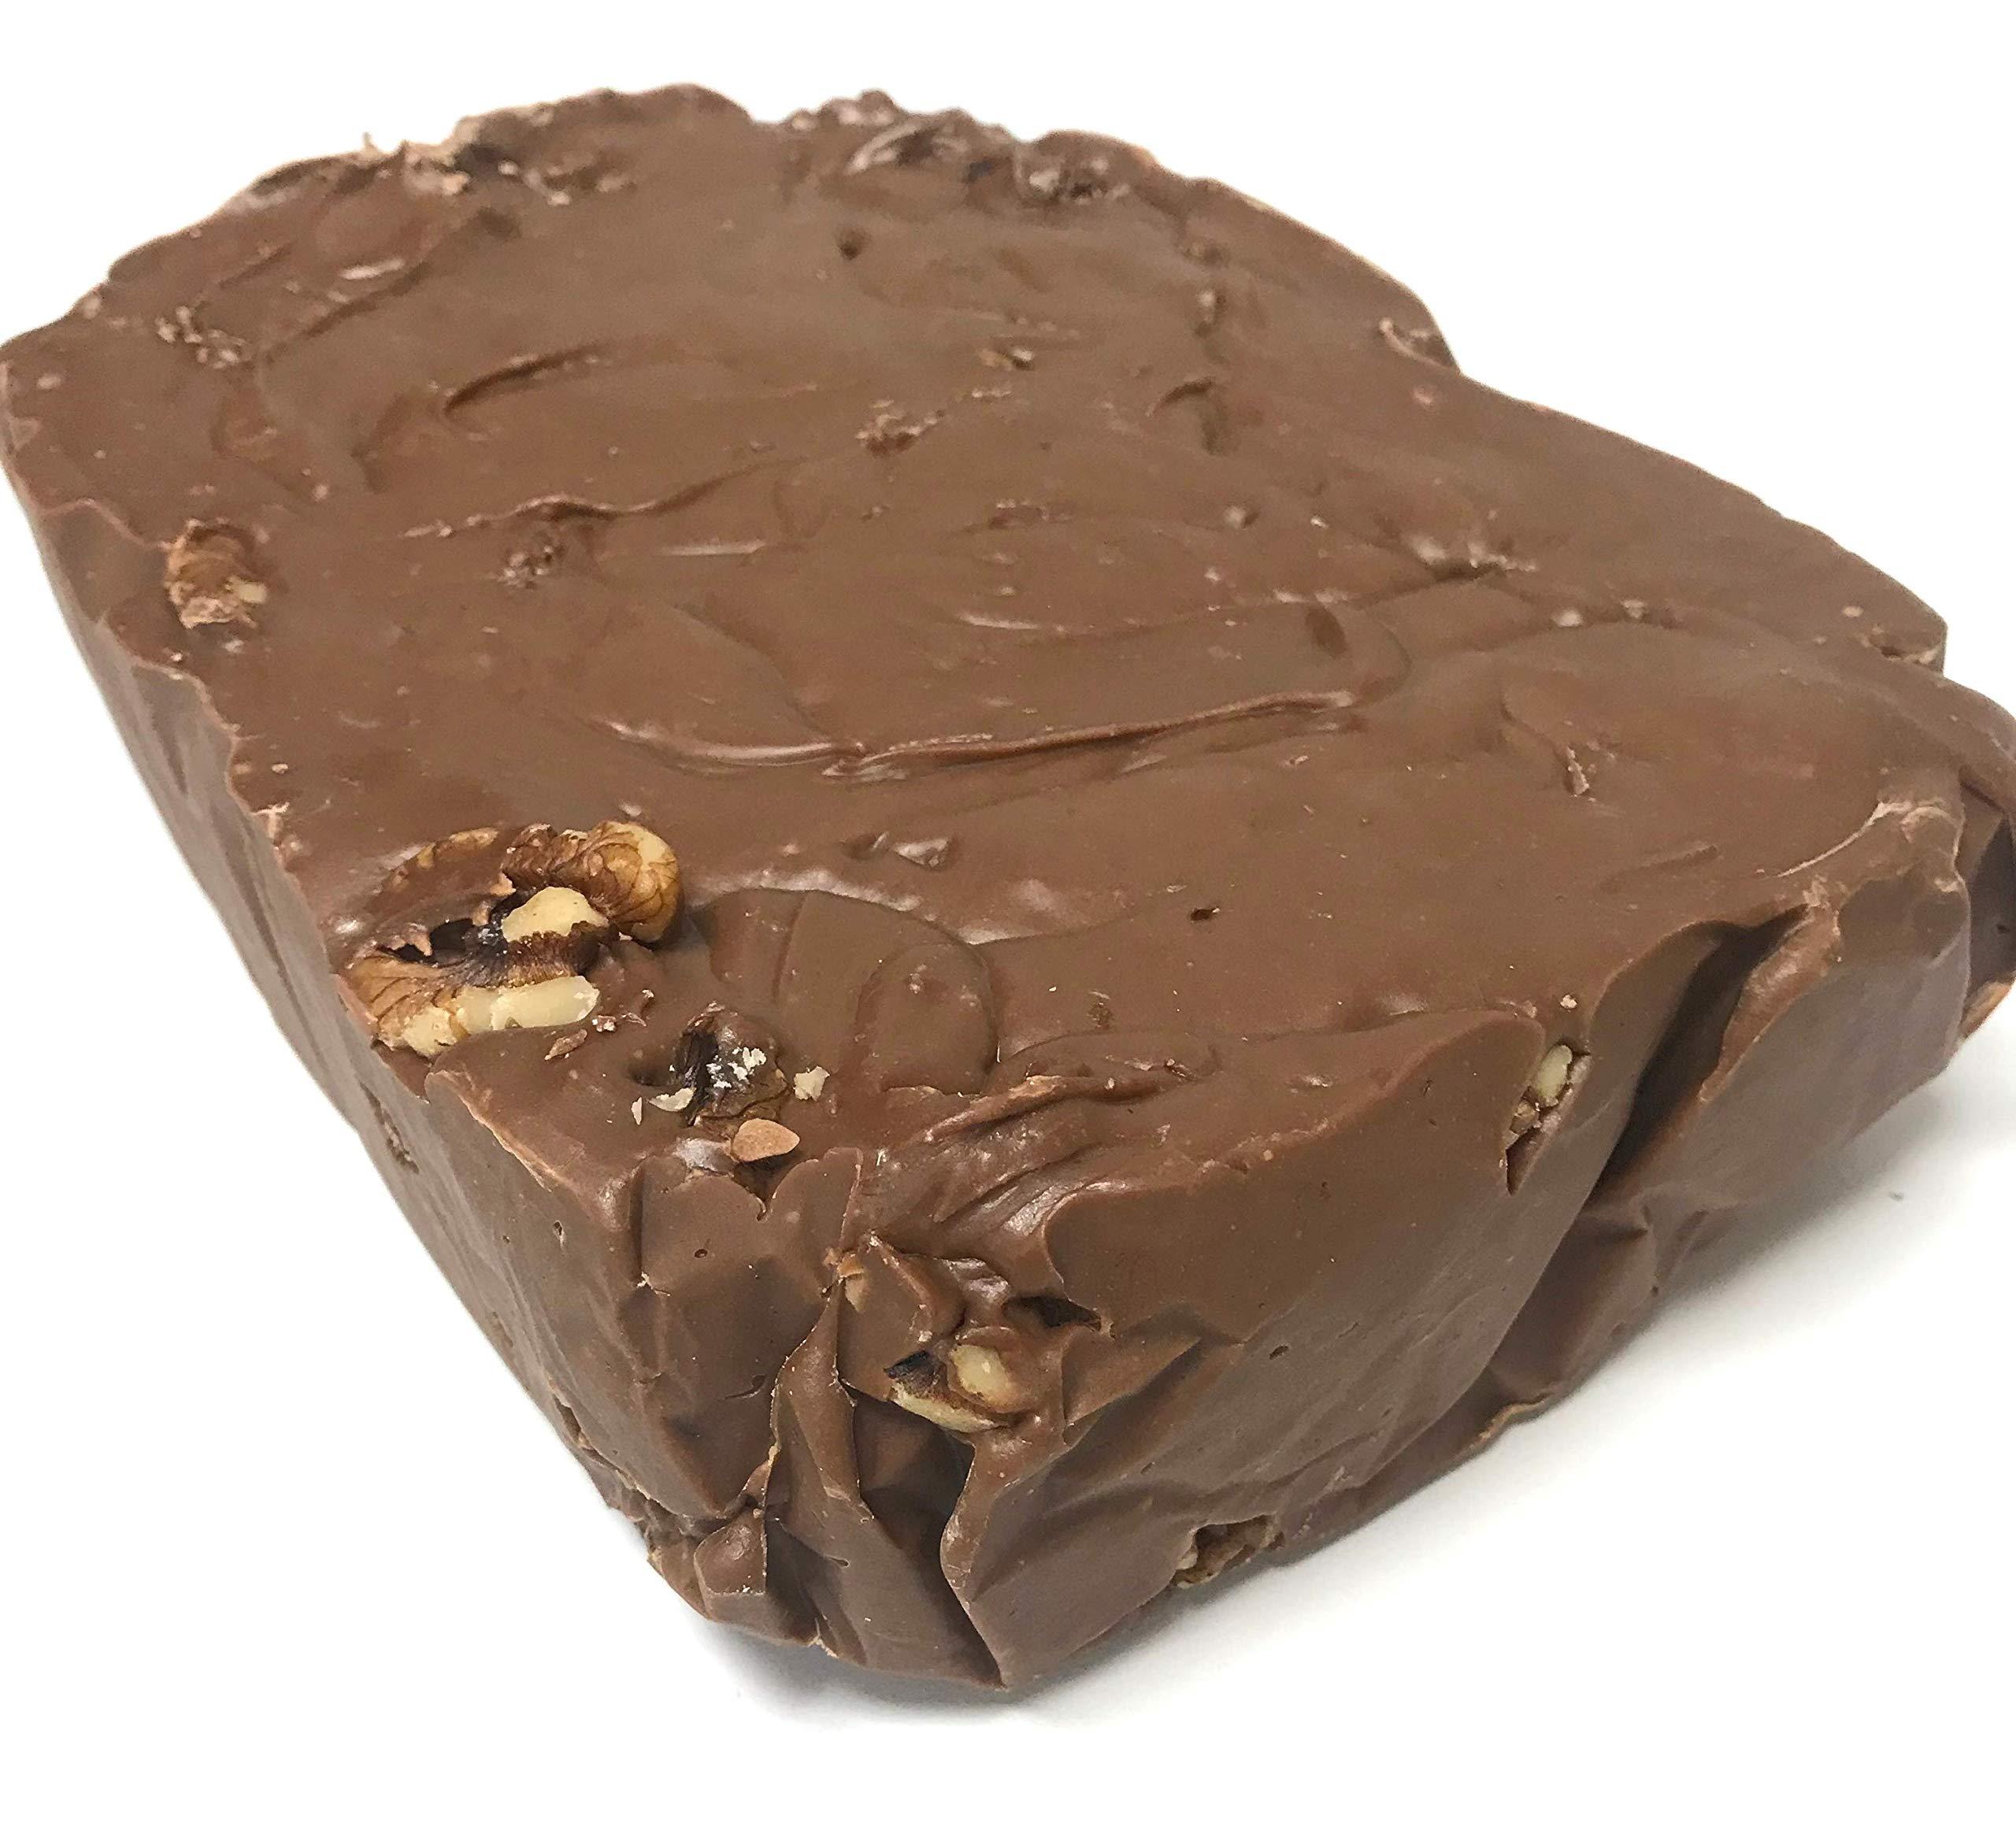 Handmade Fudge 5 Lb. Loaf Chocolate Walnut